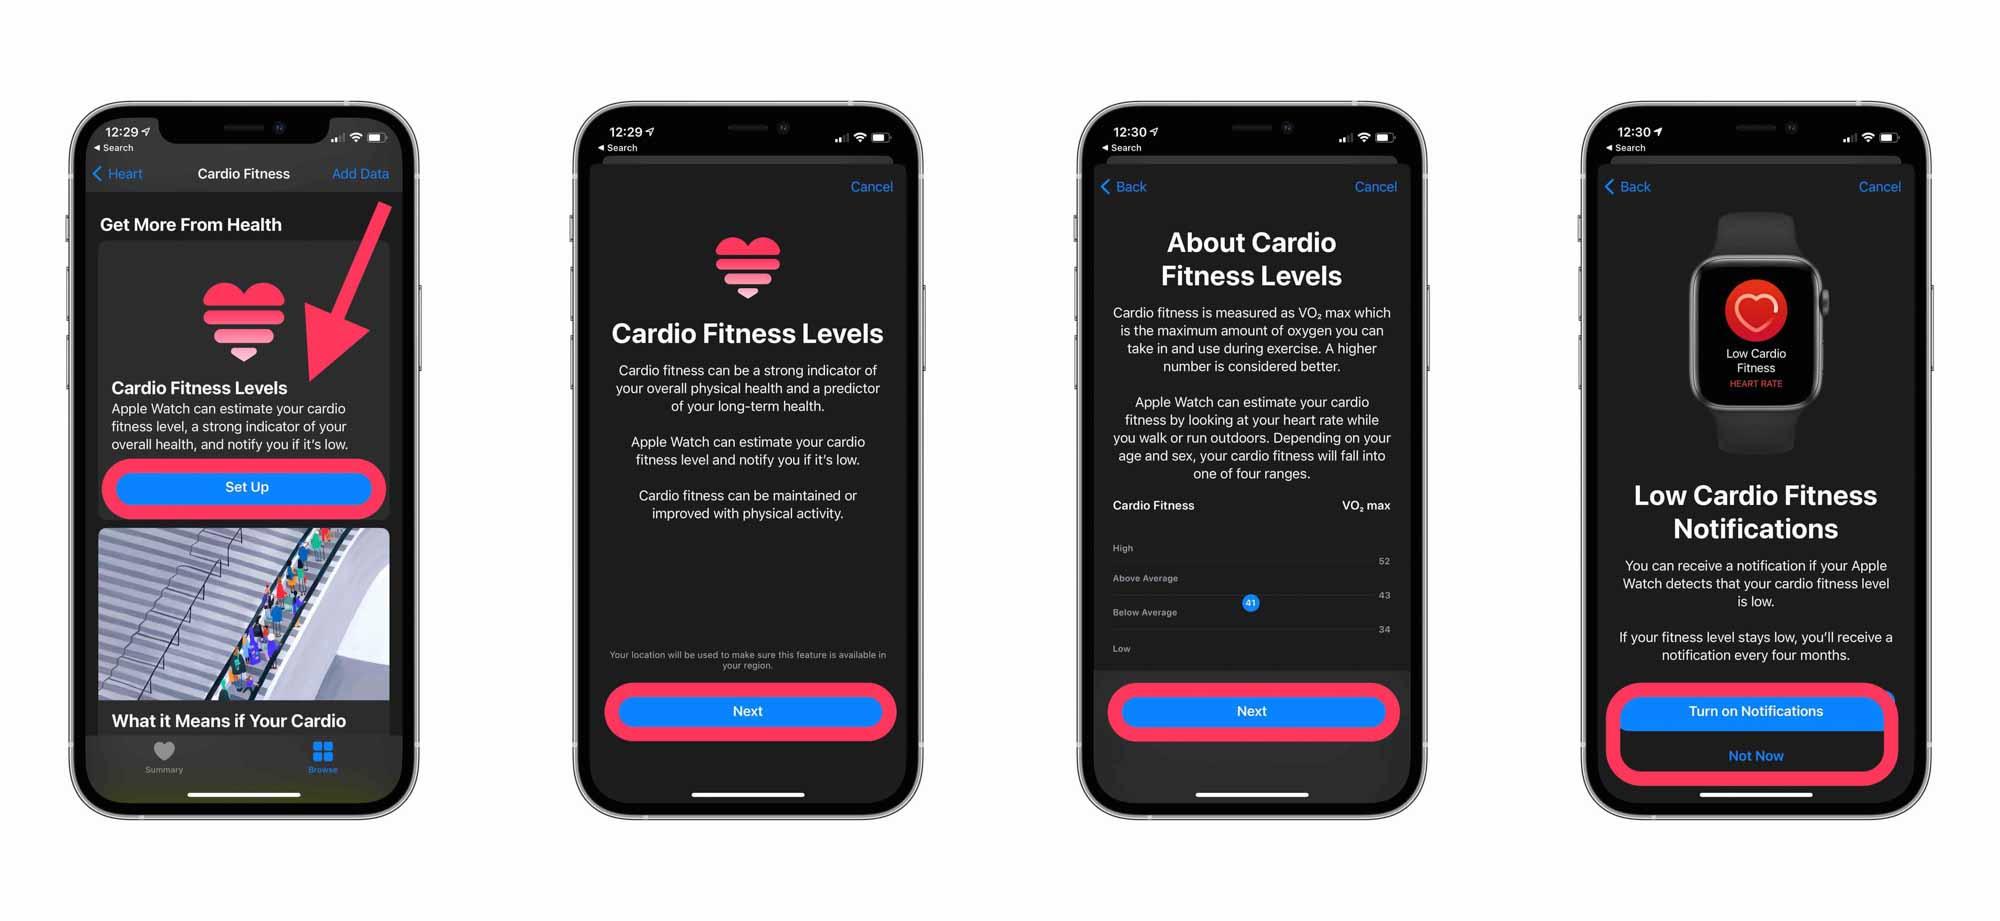 Пошаговое руководство по использованию Cardio Fitness на iPhone и Apple Watch